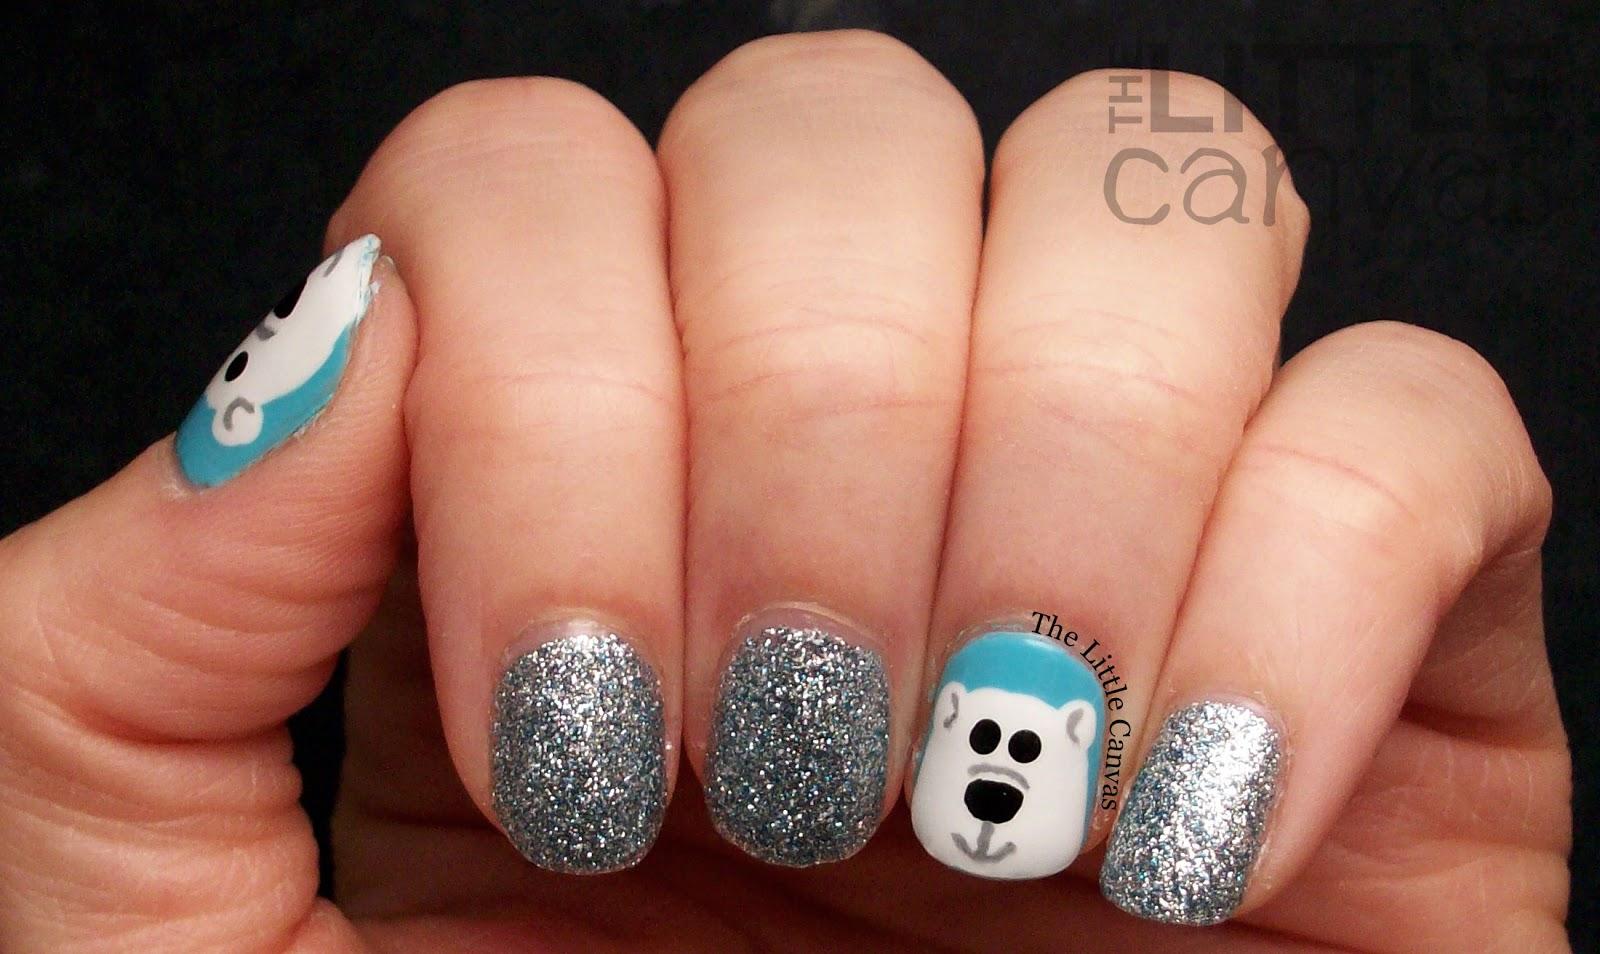 Polar Bear Nail Art - The Little Canvas